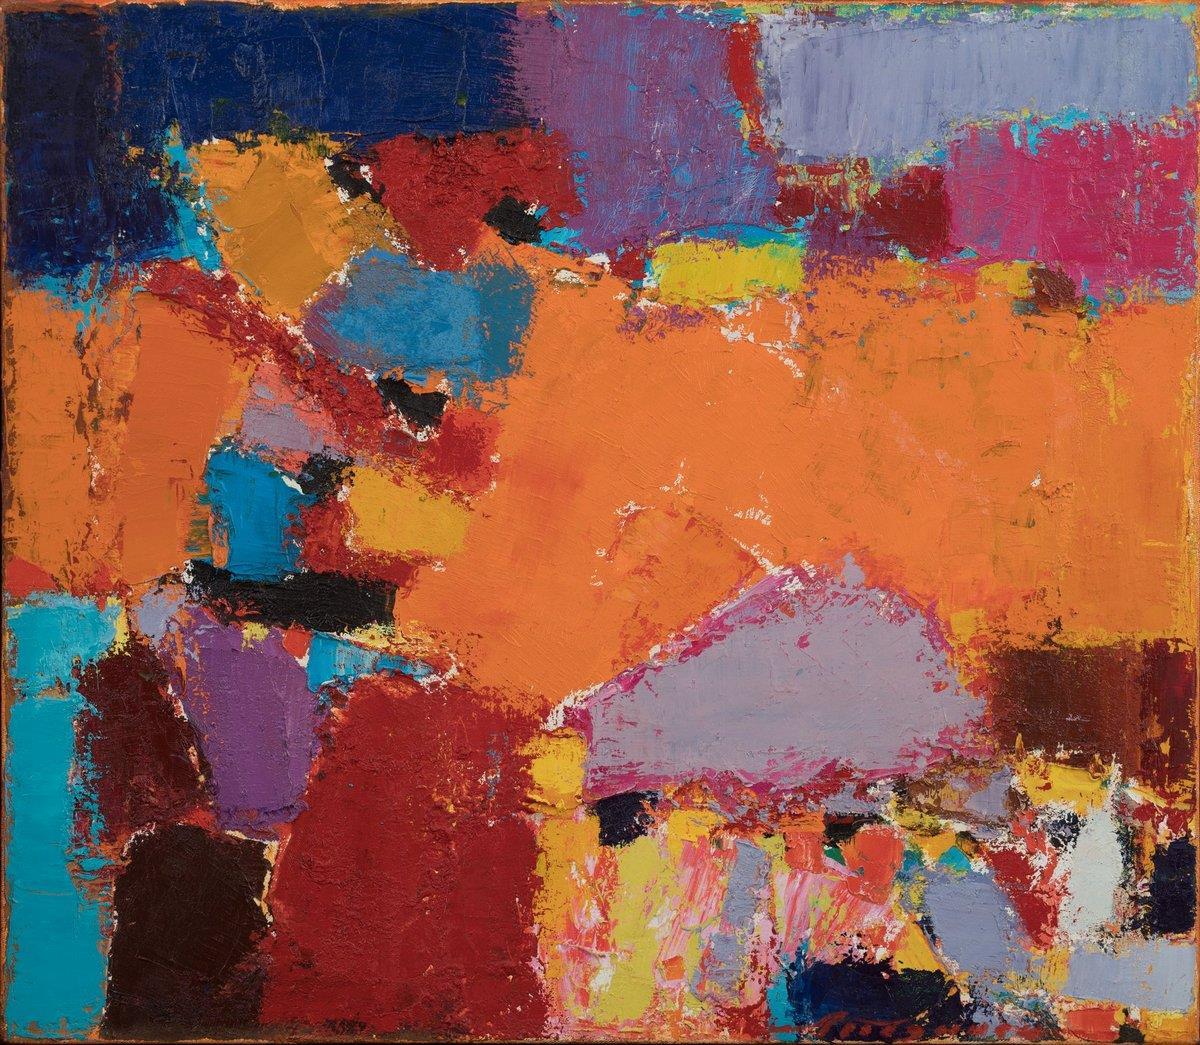 VIRTUAL MUSEUM OF CONTEMPORARY UKRAINIAN ART: Petr Lebedinets - on the path of artistic truth